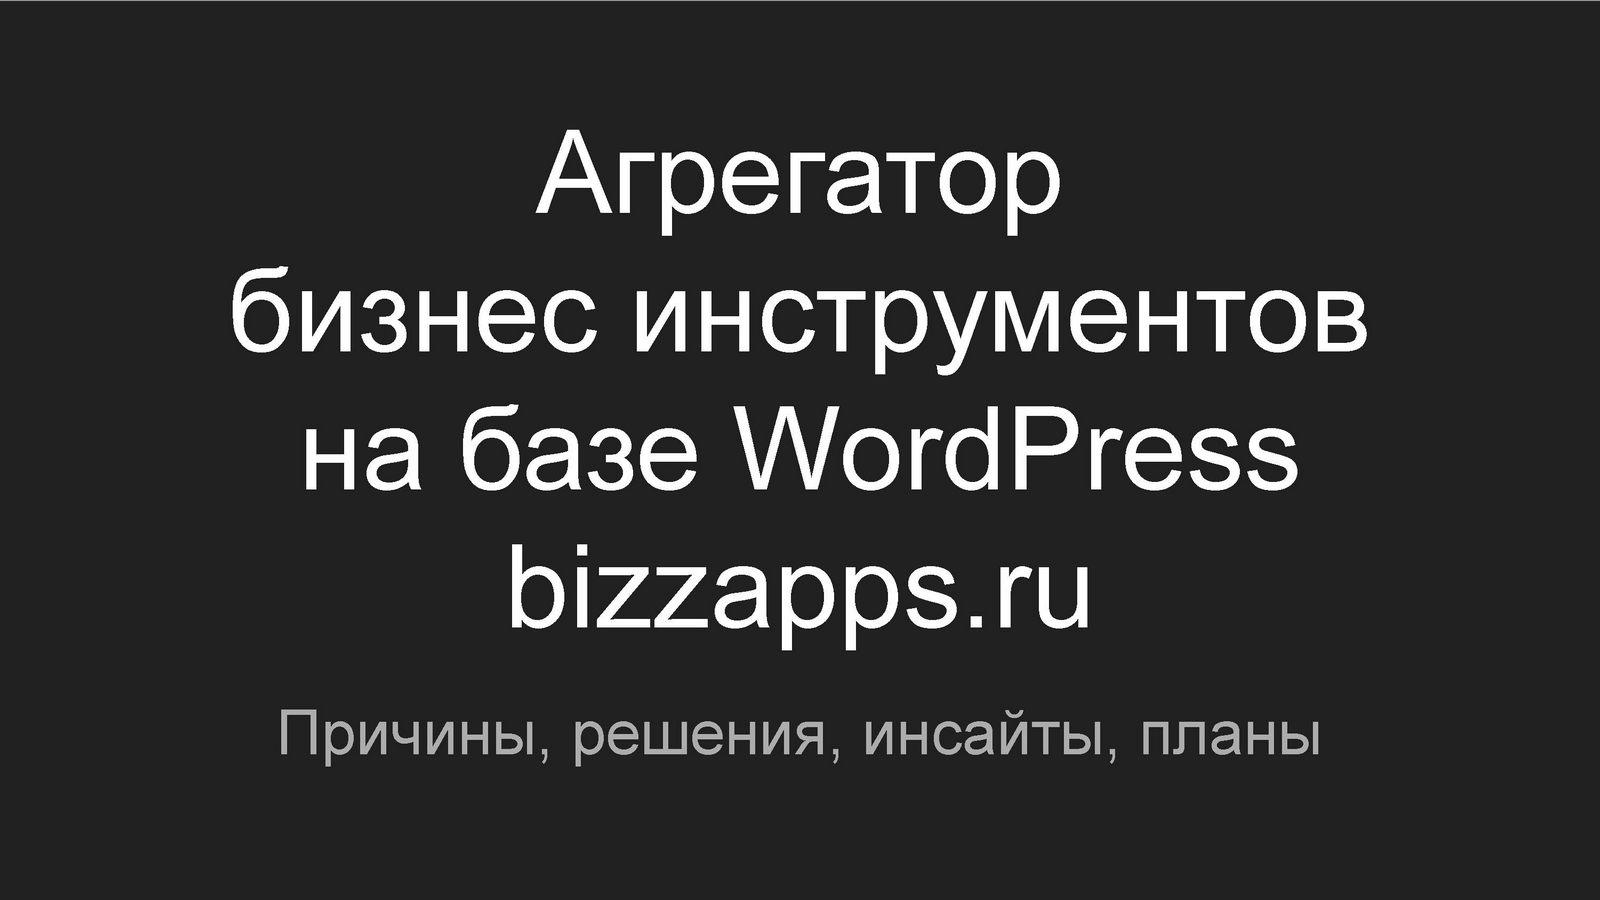 wp10-Анатолий Юмашев-Агрегатор bizzapps.ru 01